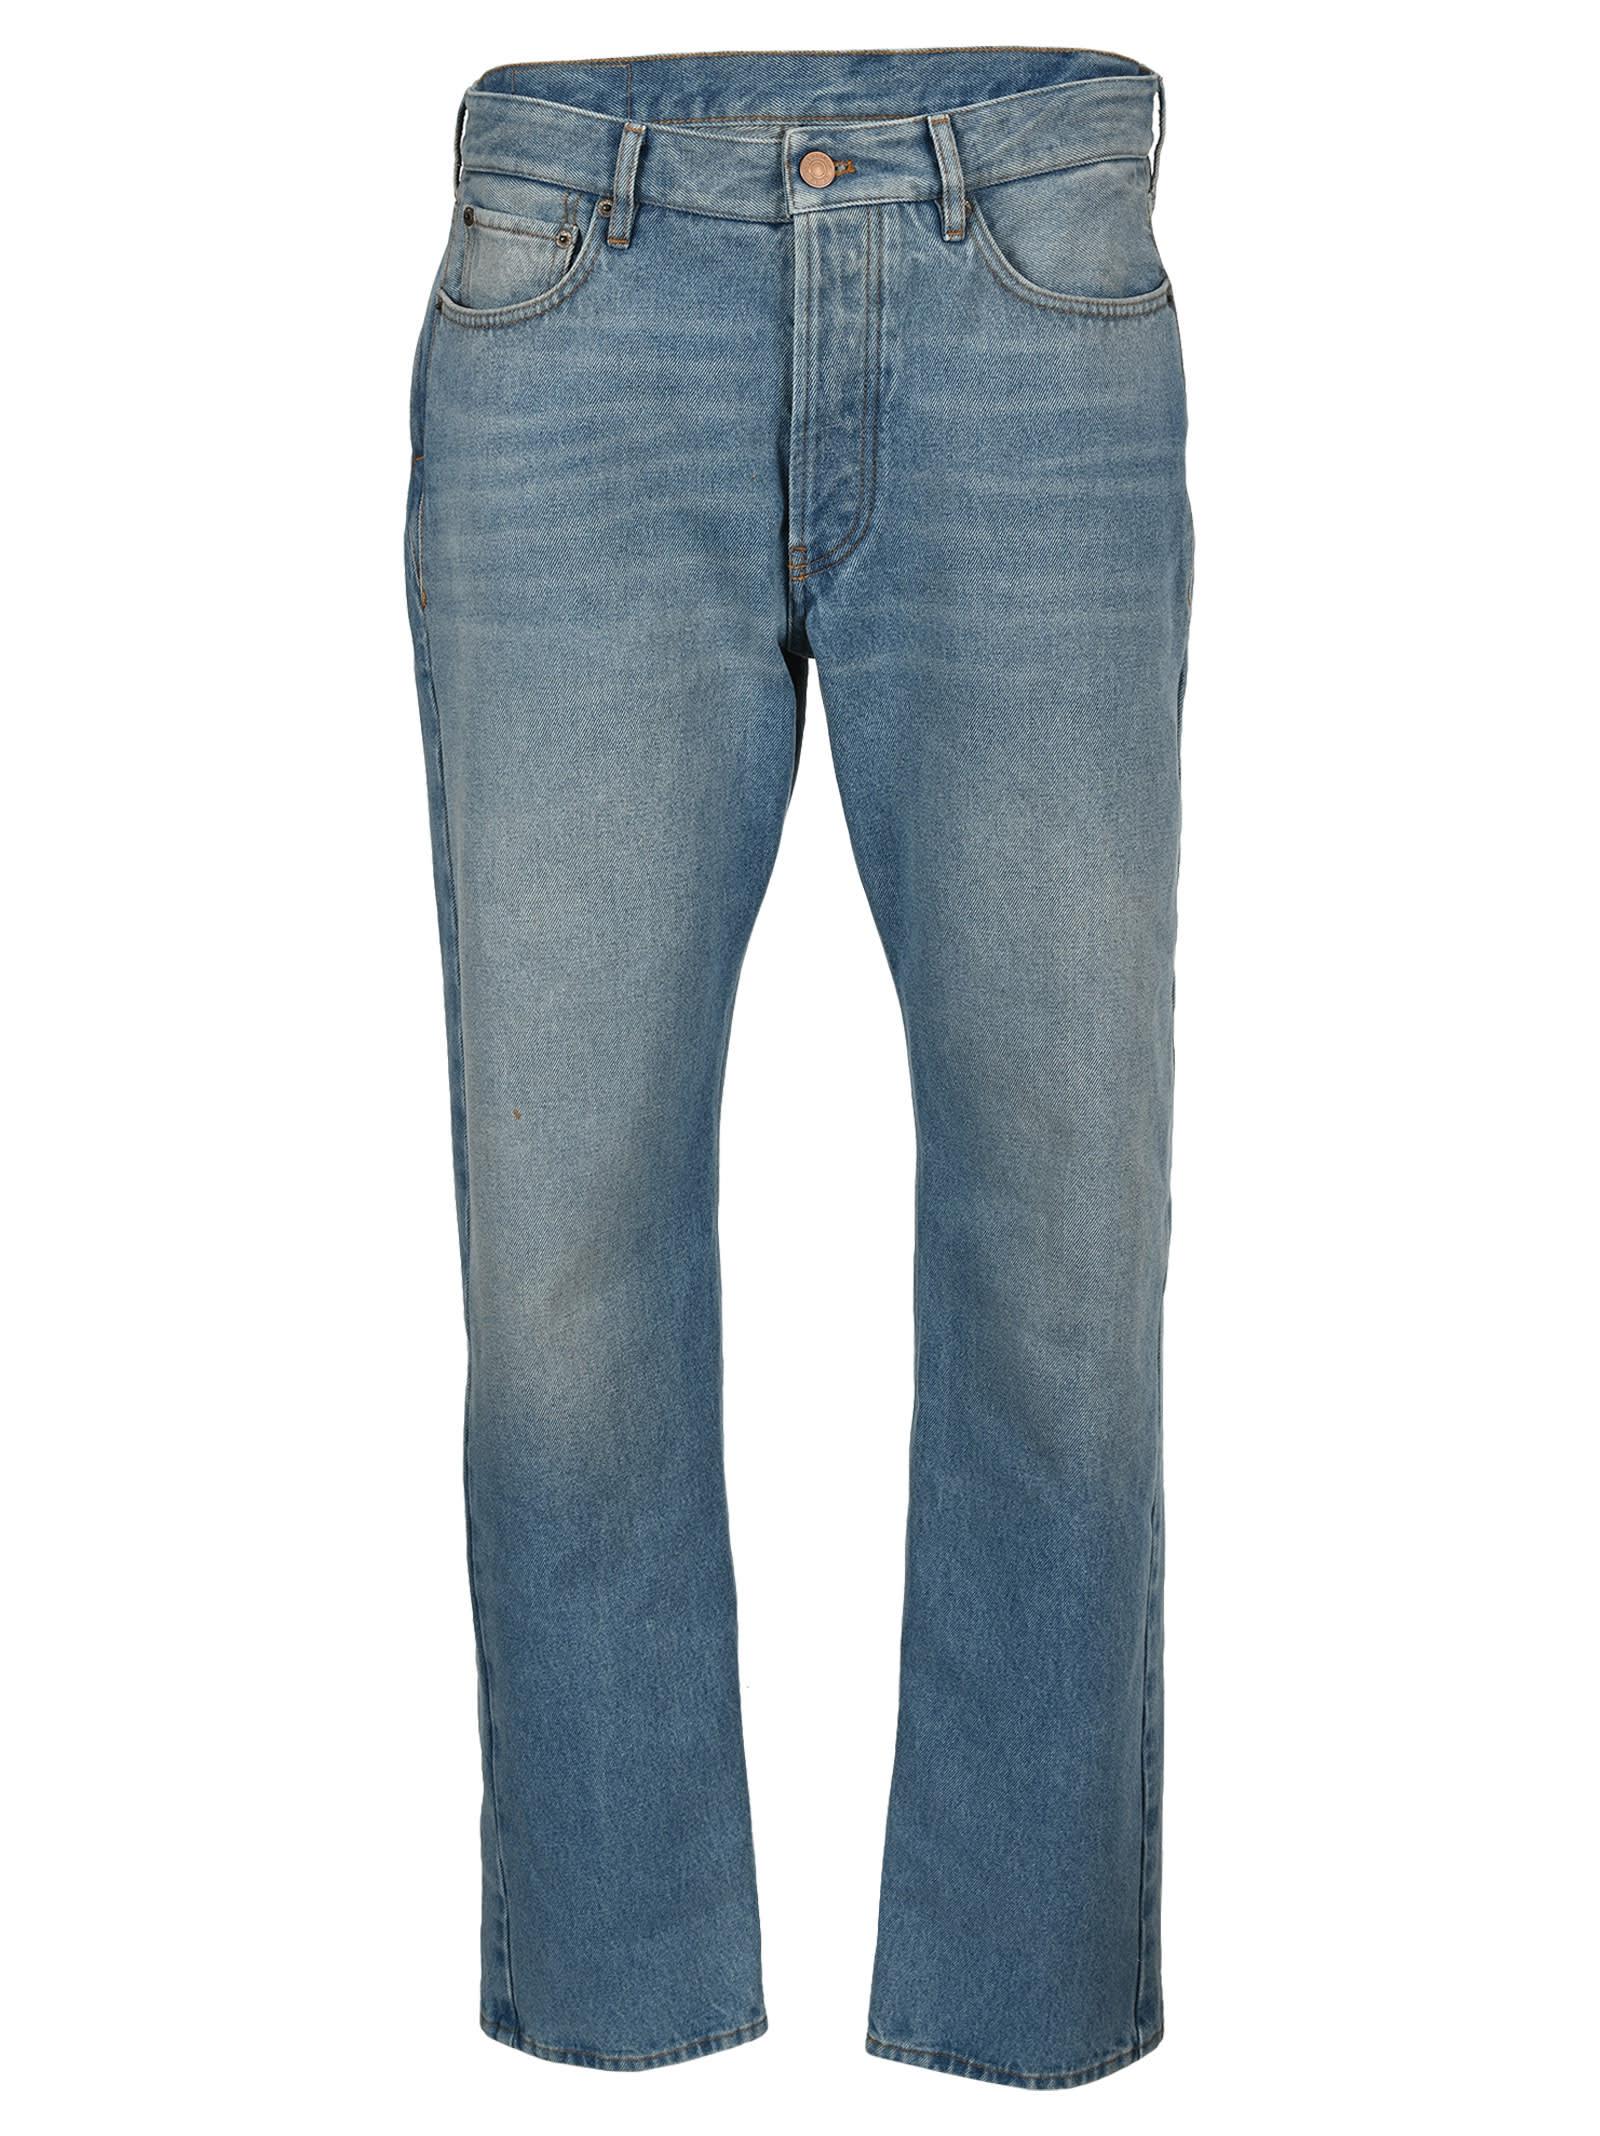 Balenciaga Flatground Slim Jeans